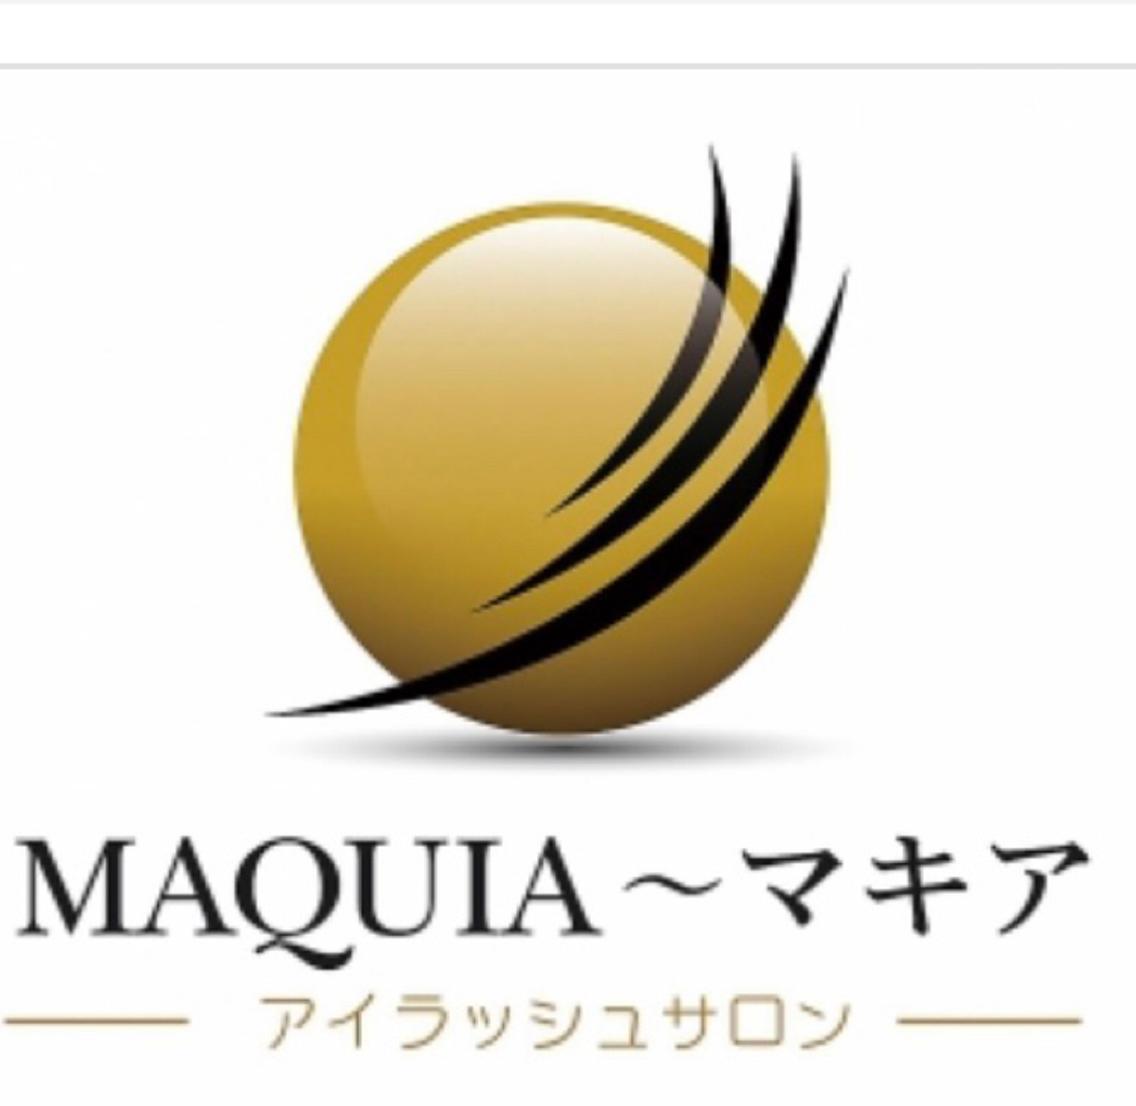 MAQUIA天王寺店所属・MAQUIA天王寺 和田の掲載